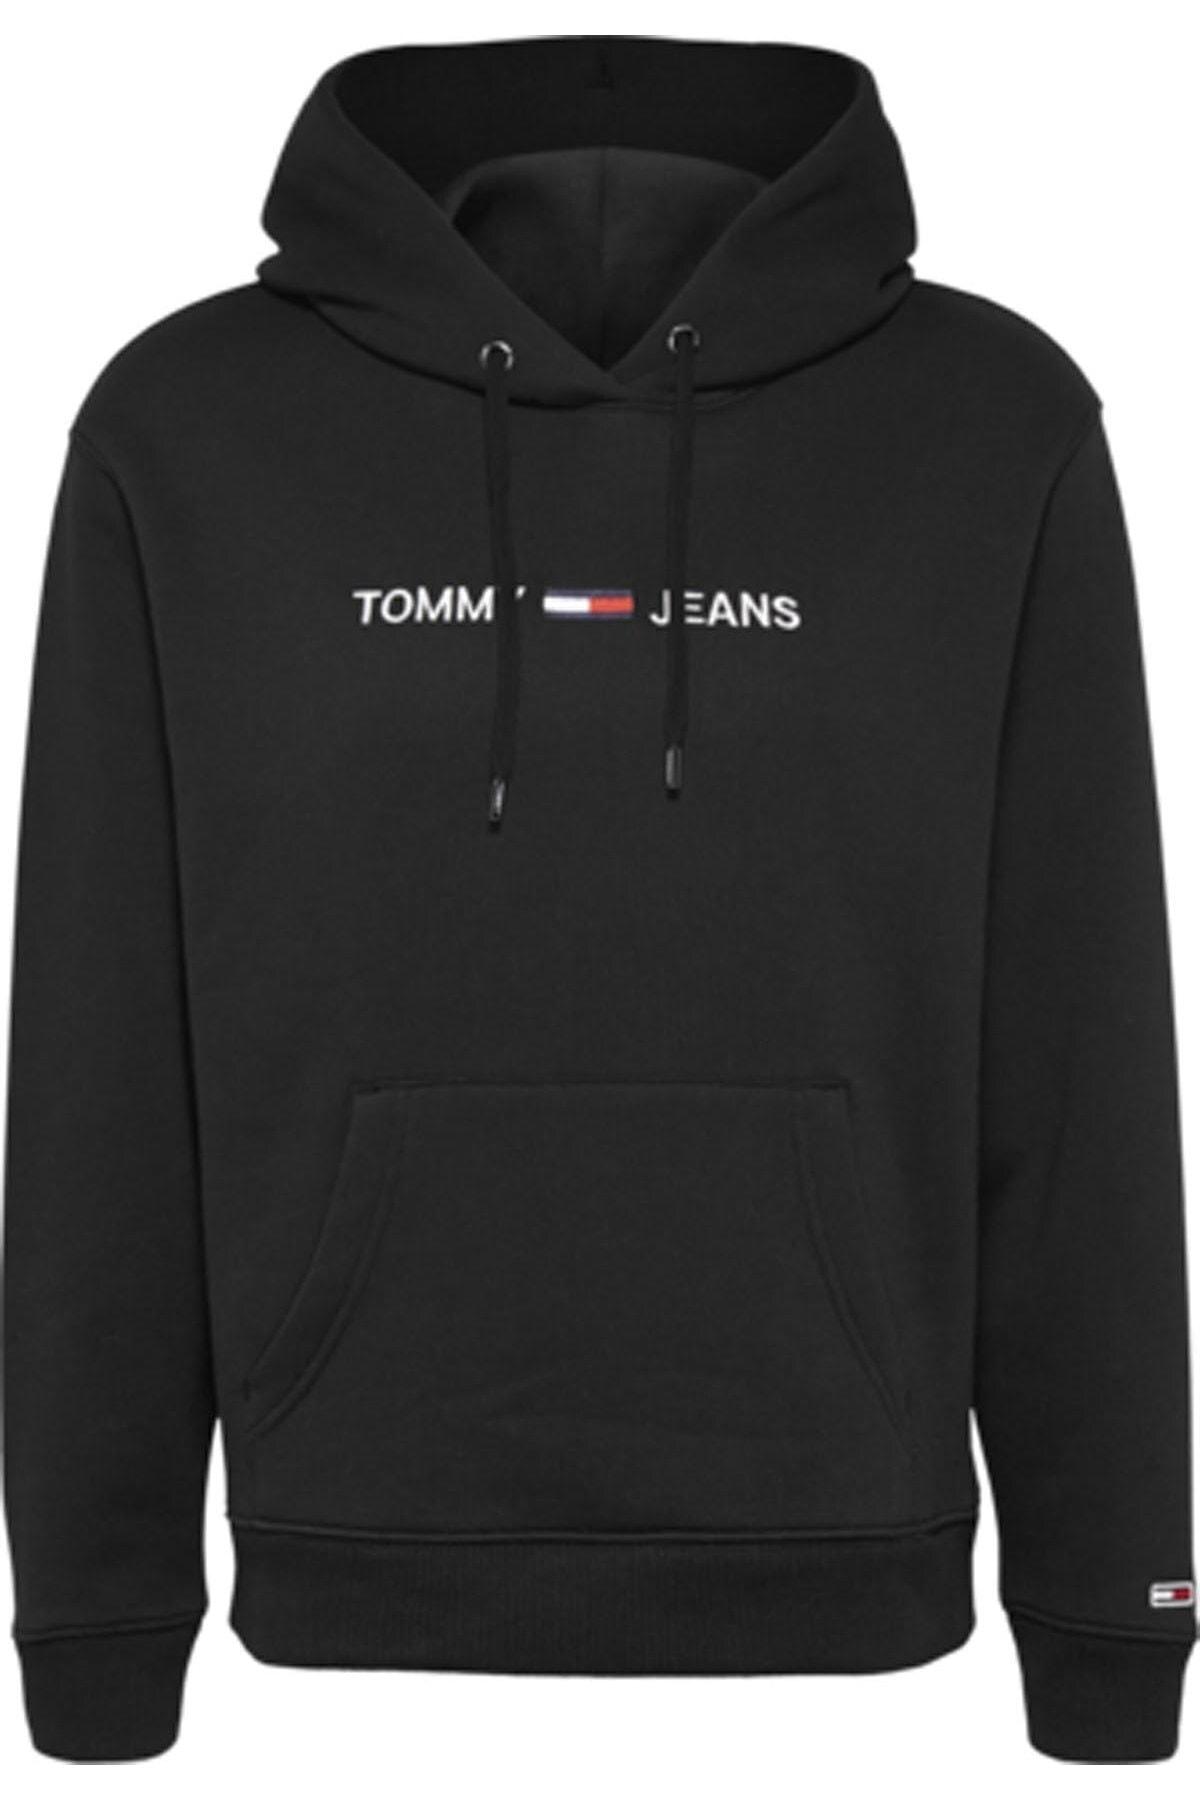 Tommy Hilfiger Kadın Siyah Sweatshirt Tjw Lınear Logo Hoodıe DW0DW08972 1